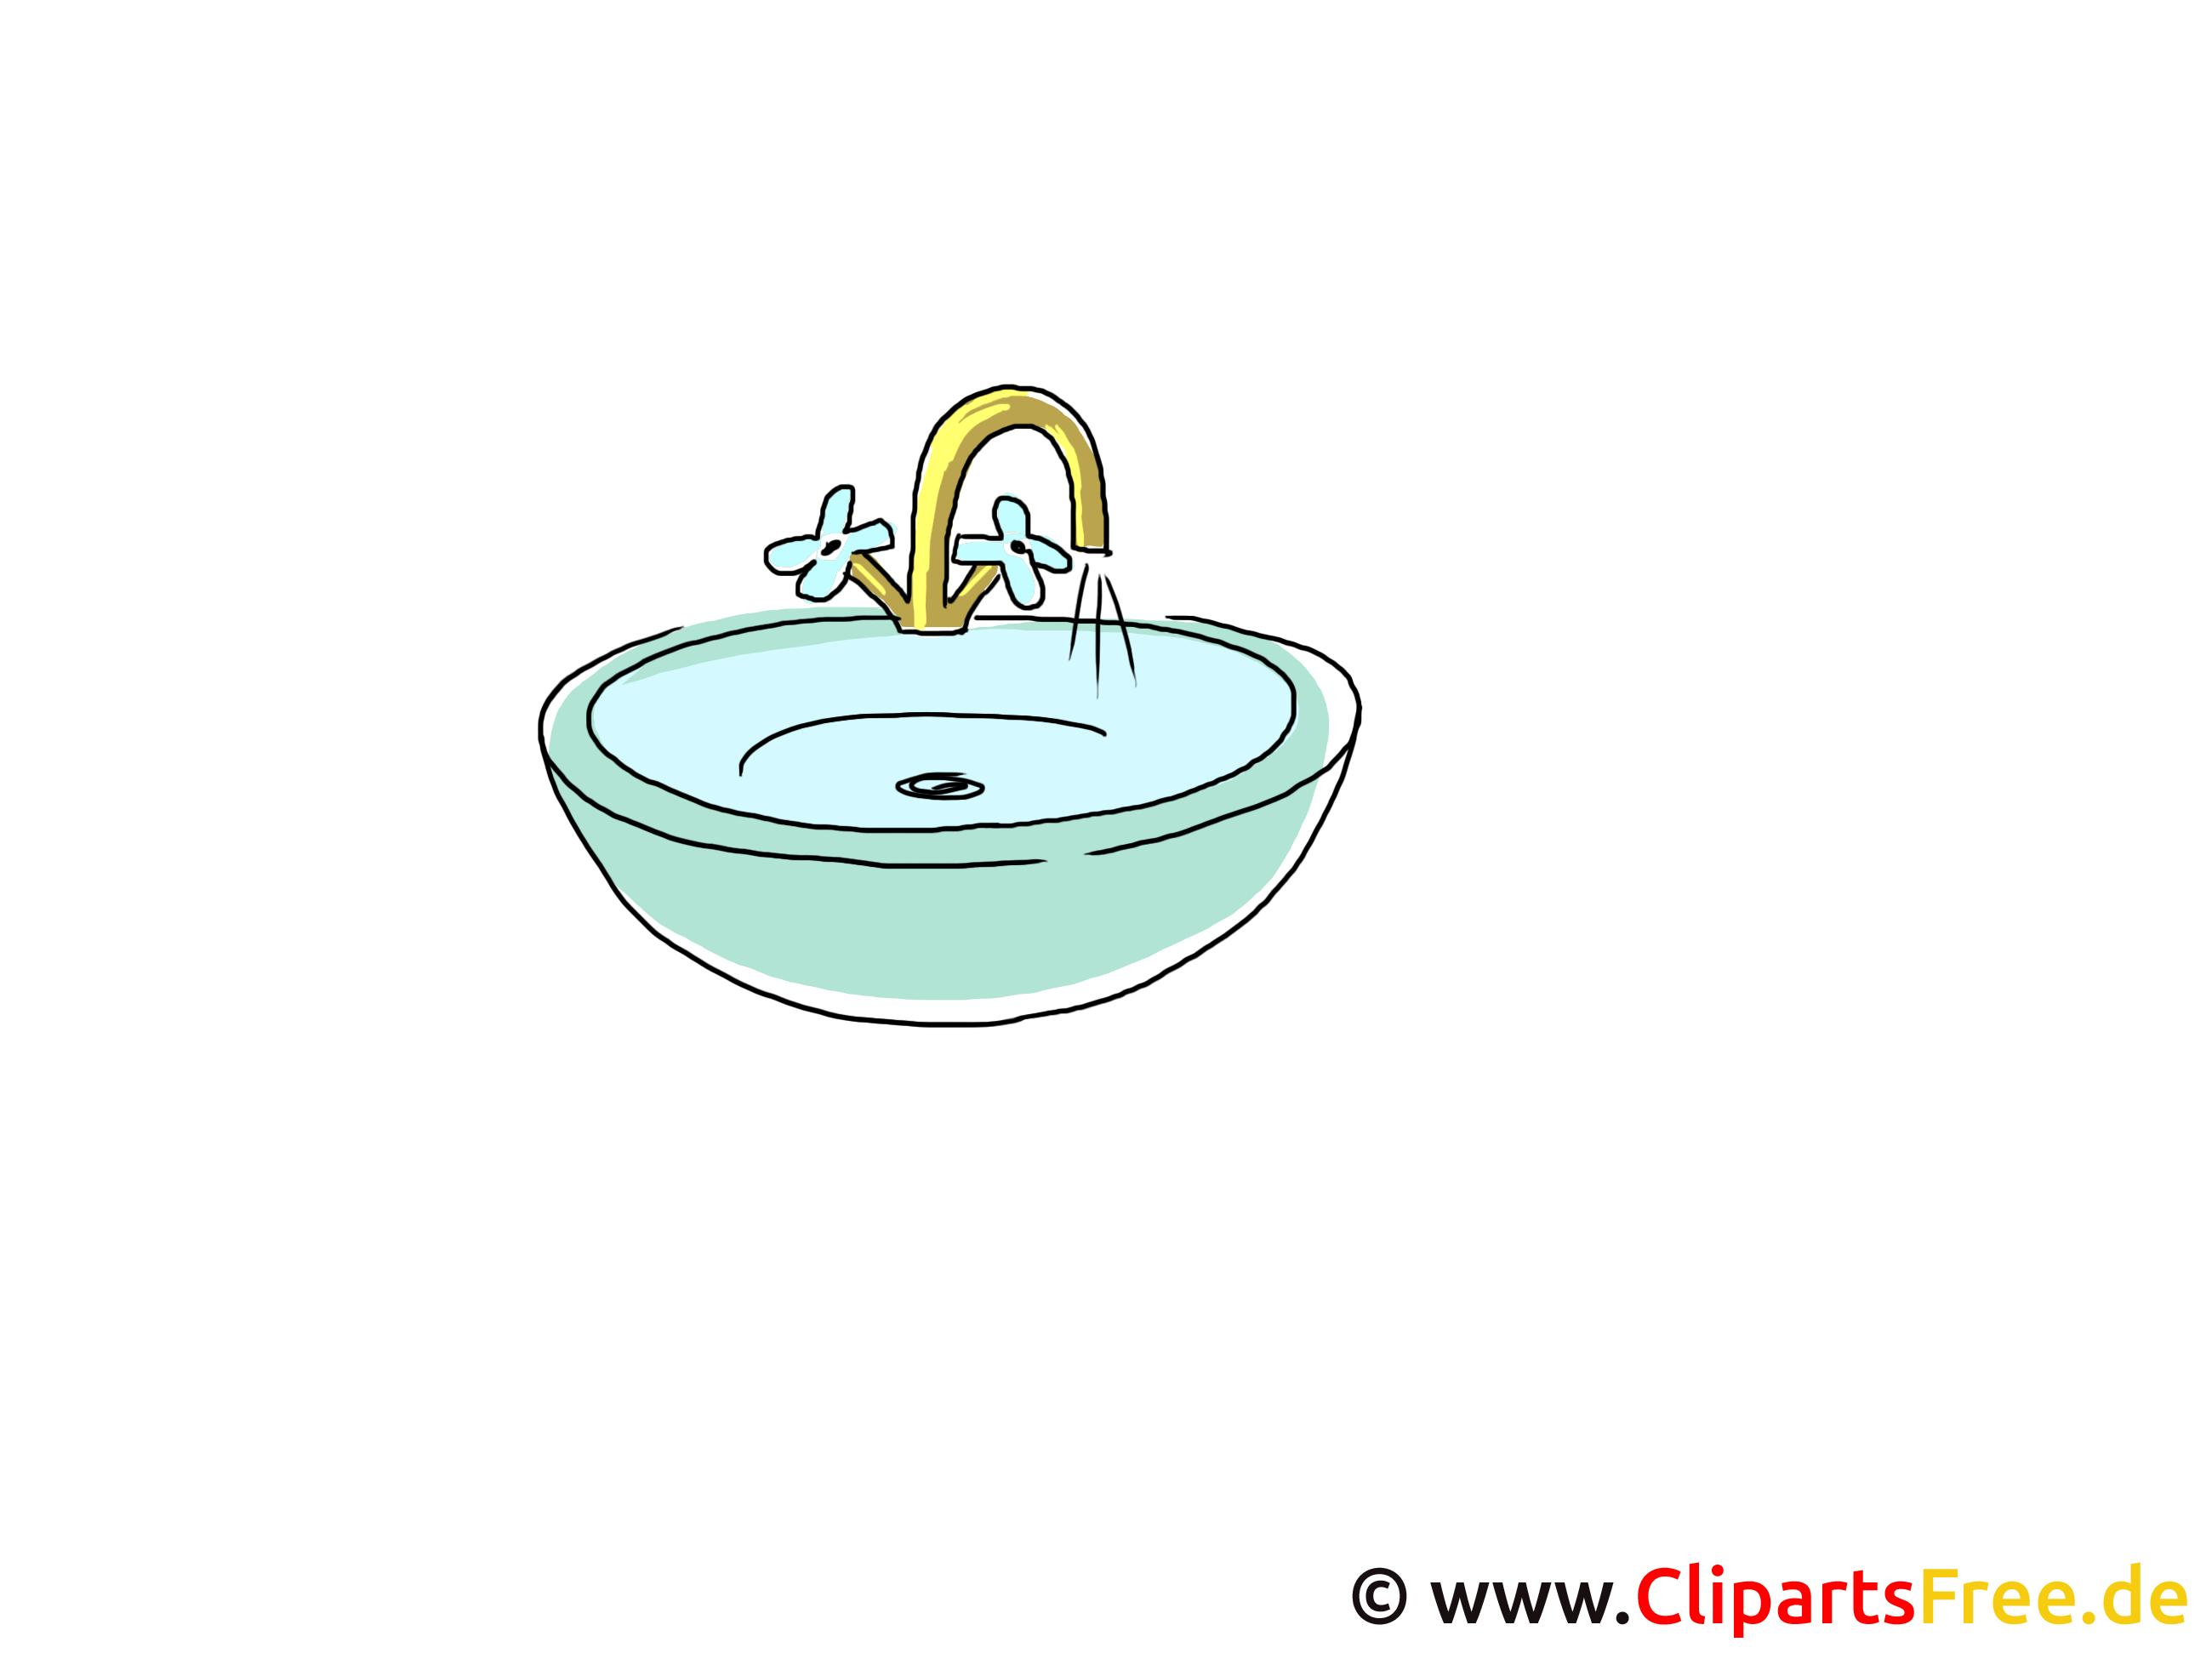 Waschbecken Clipart